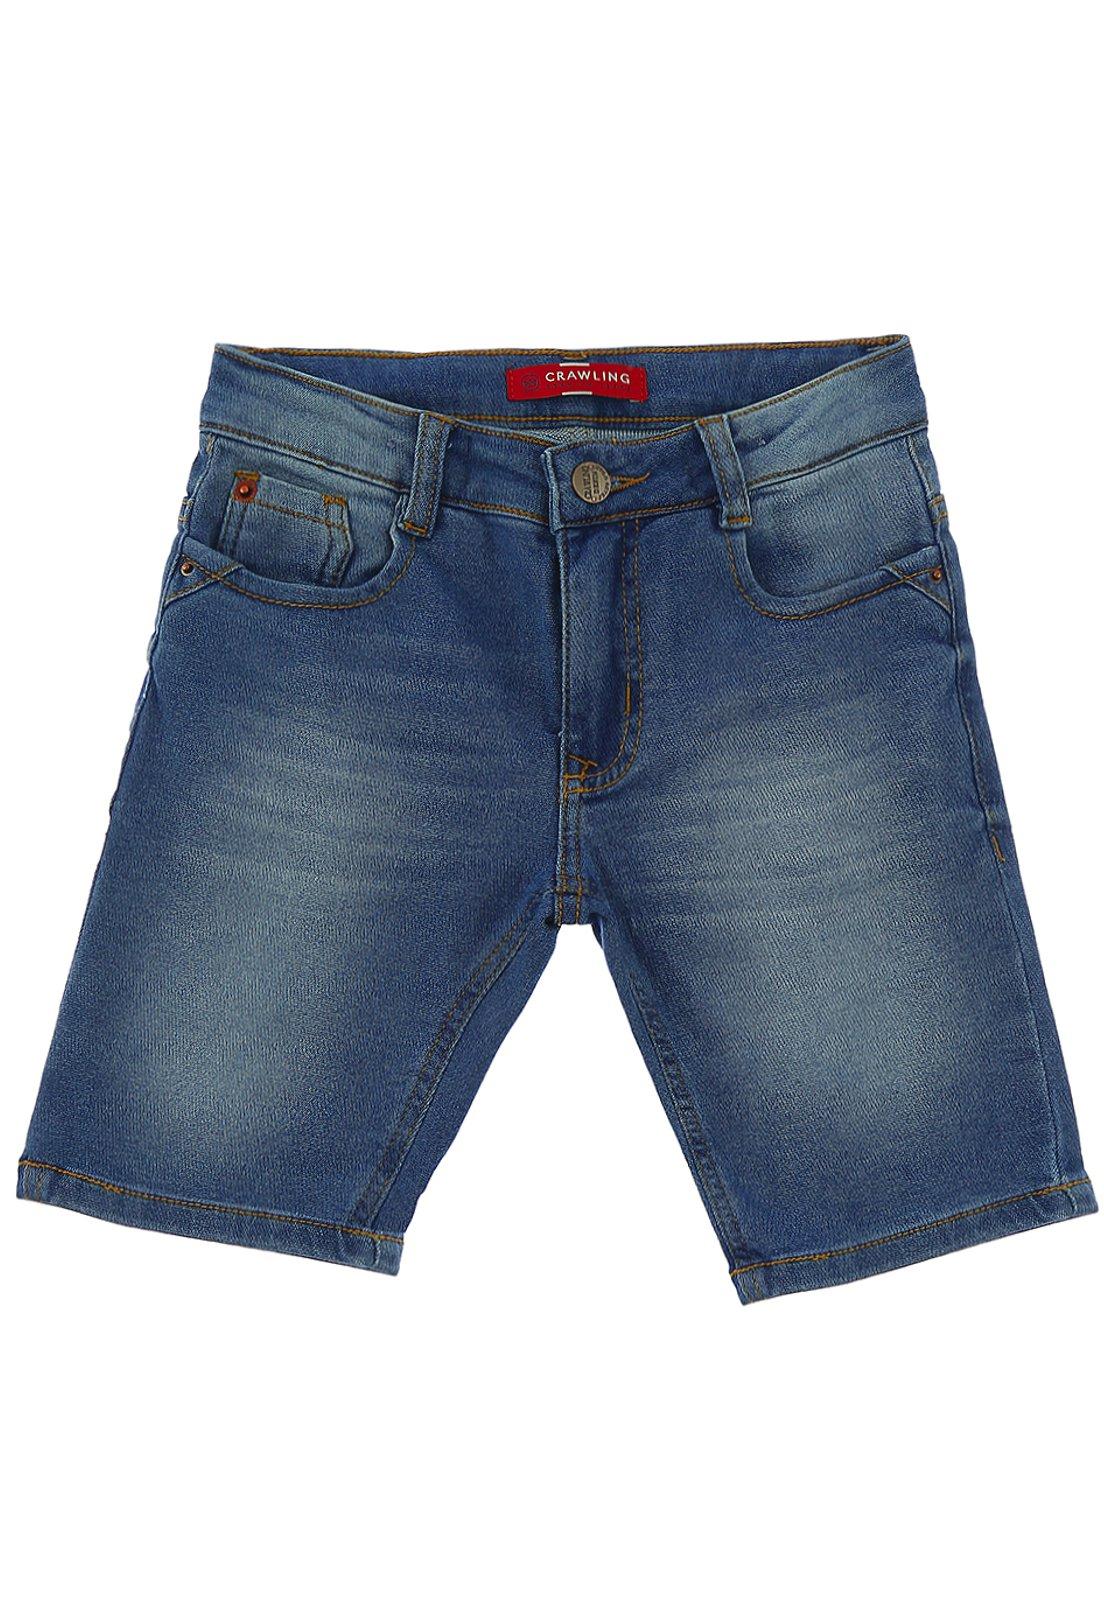 Bermuda Infantil Jeans Moletom Crawling Masculina